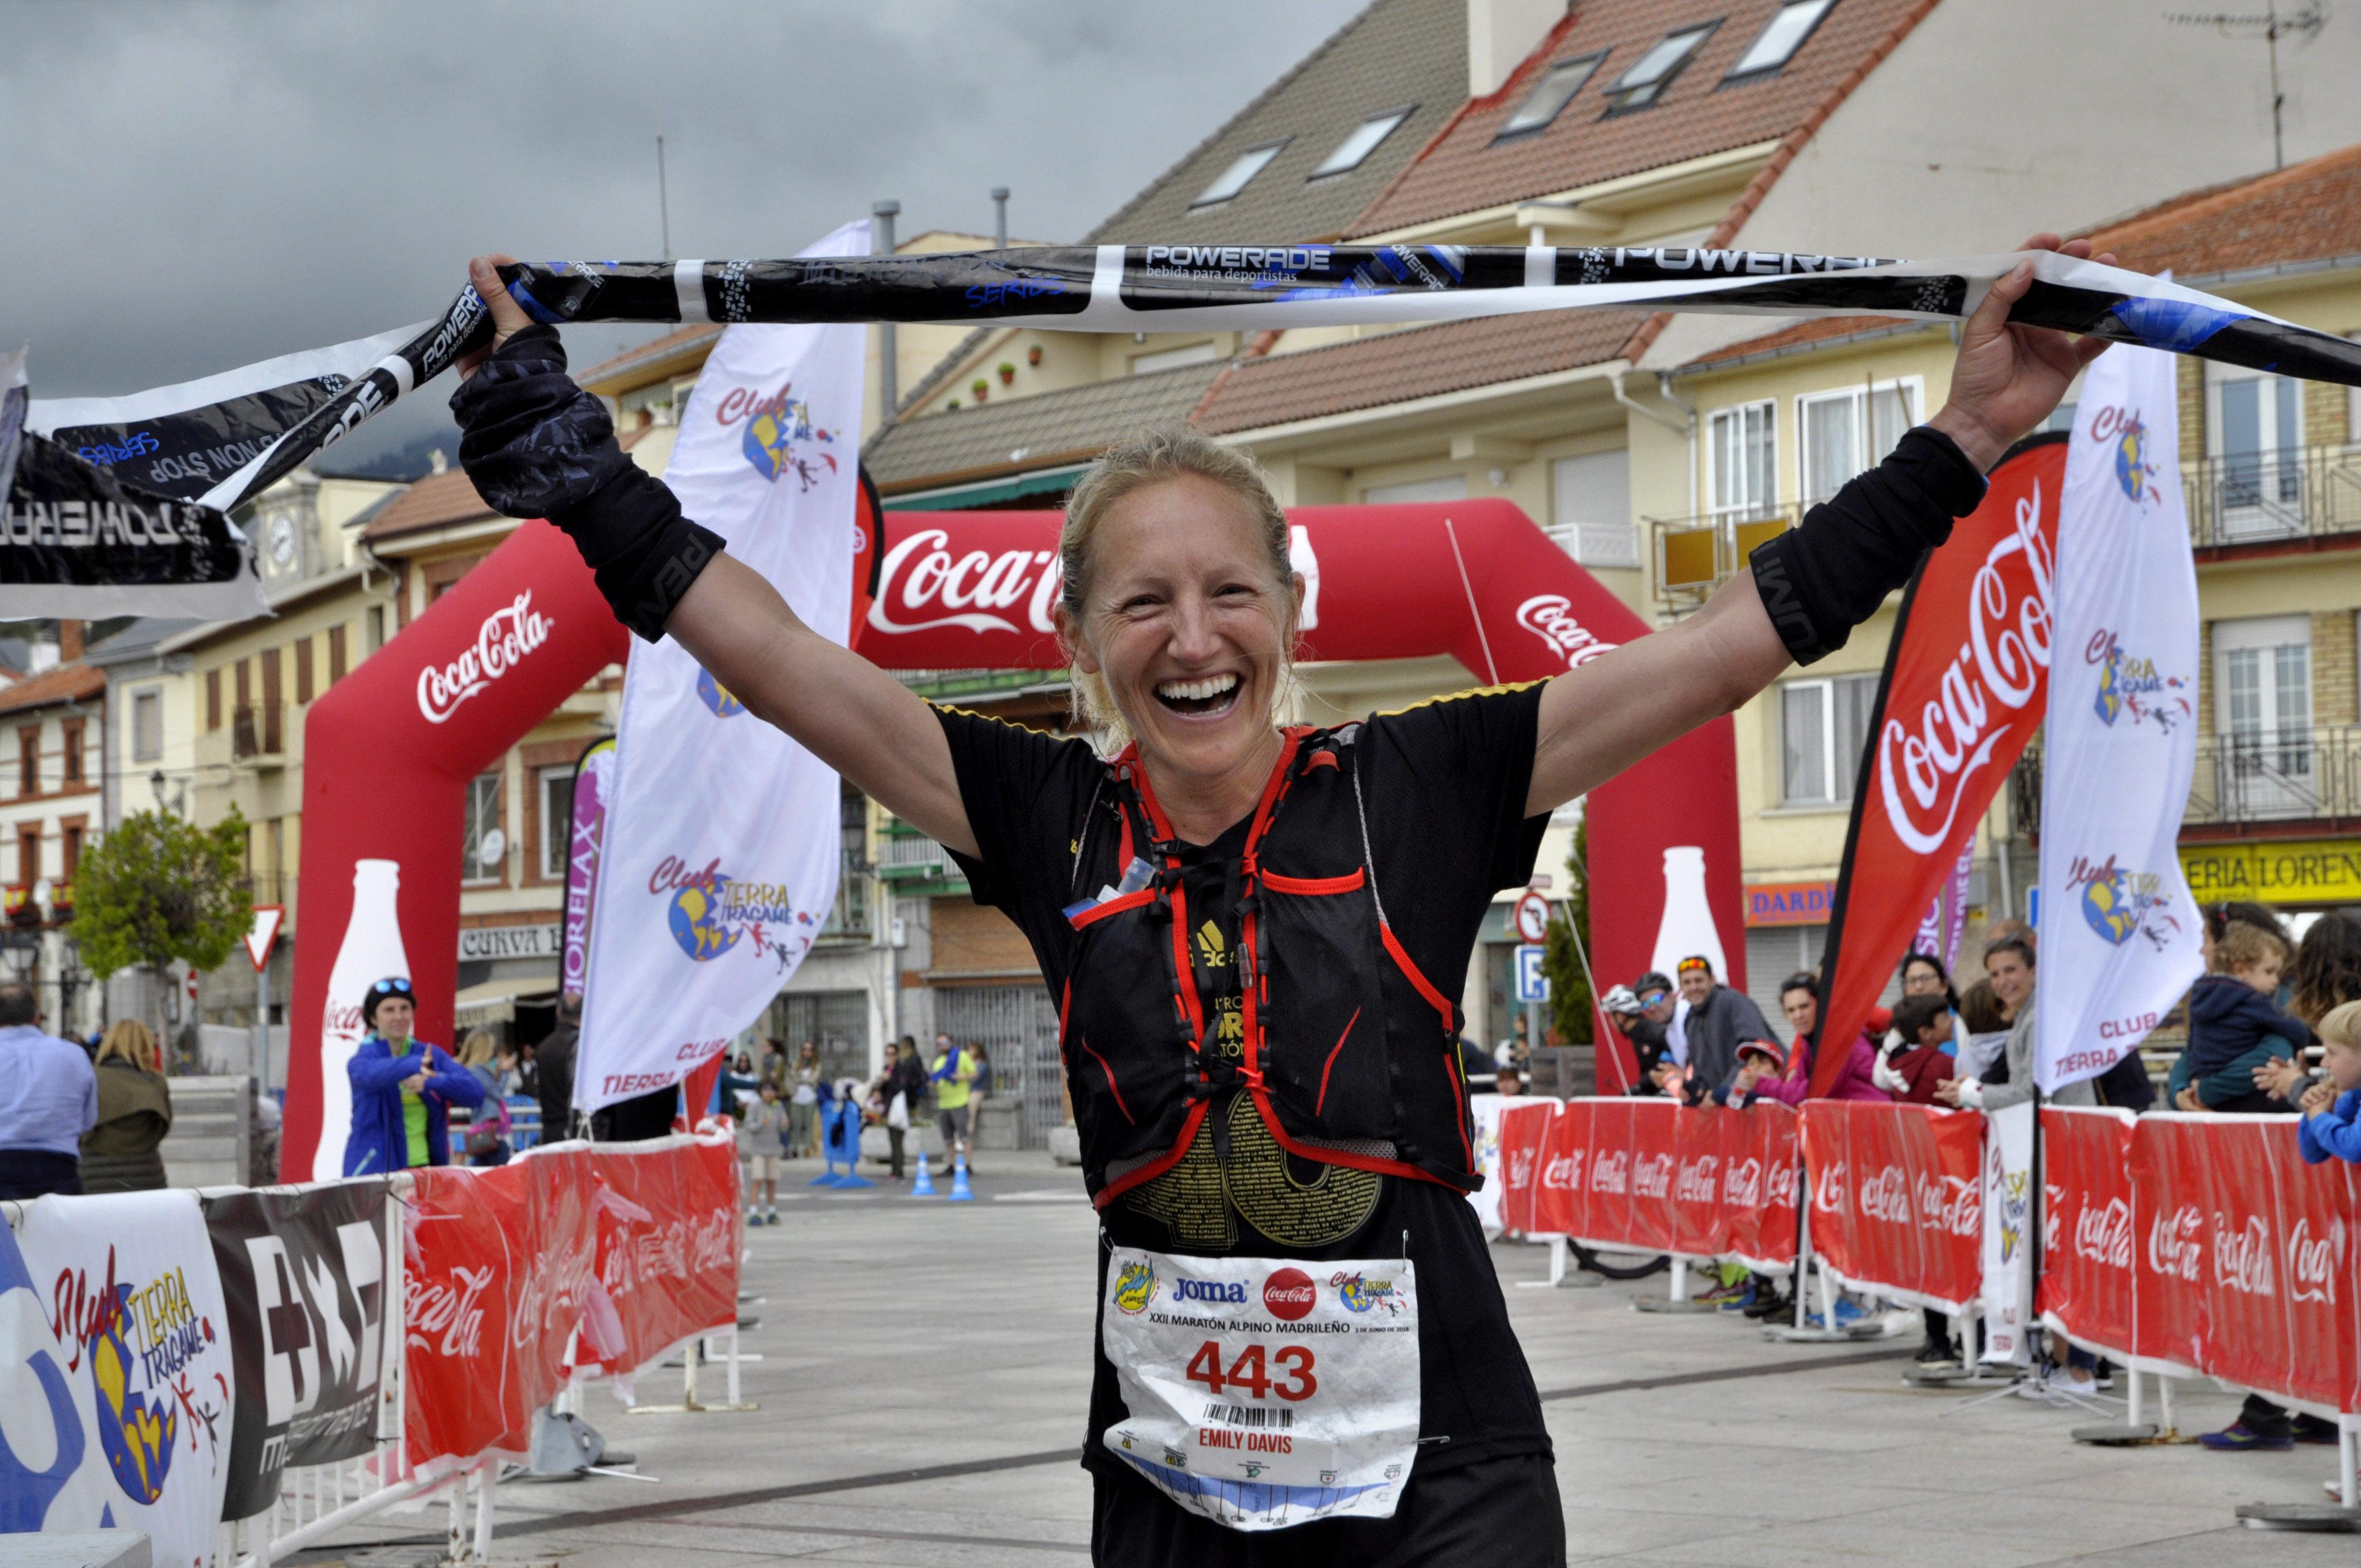 EMILY DAVIS ganadora Maraton alpino madrileño 2018